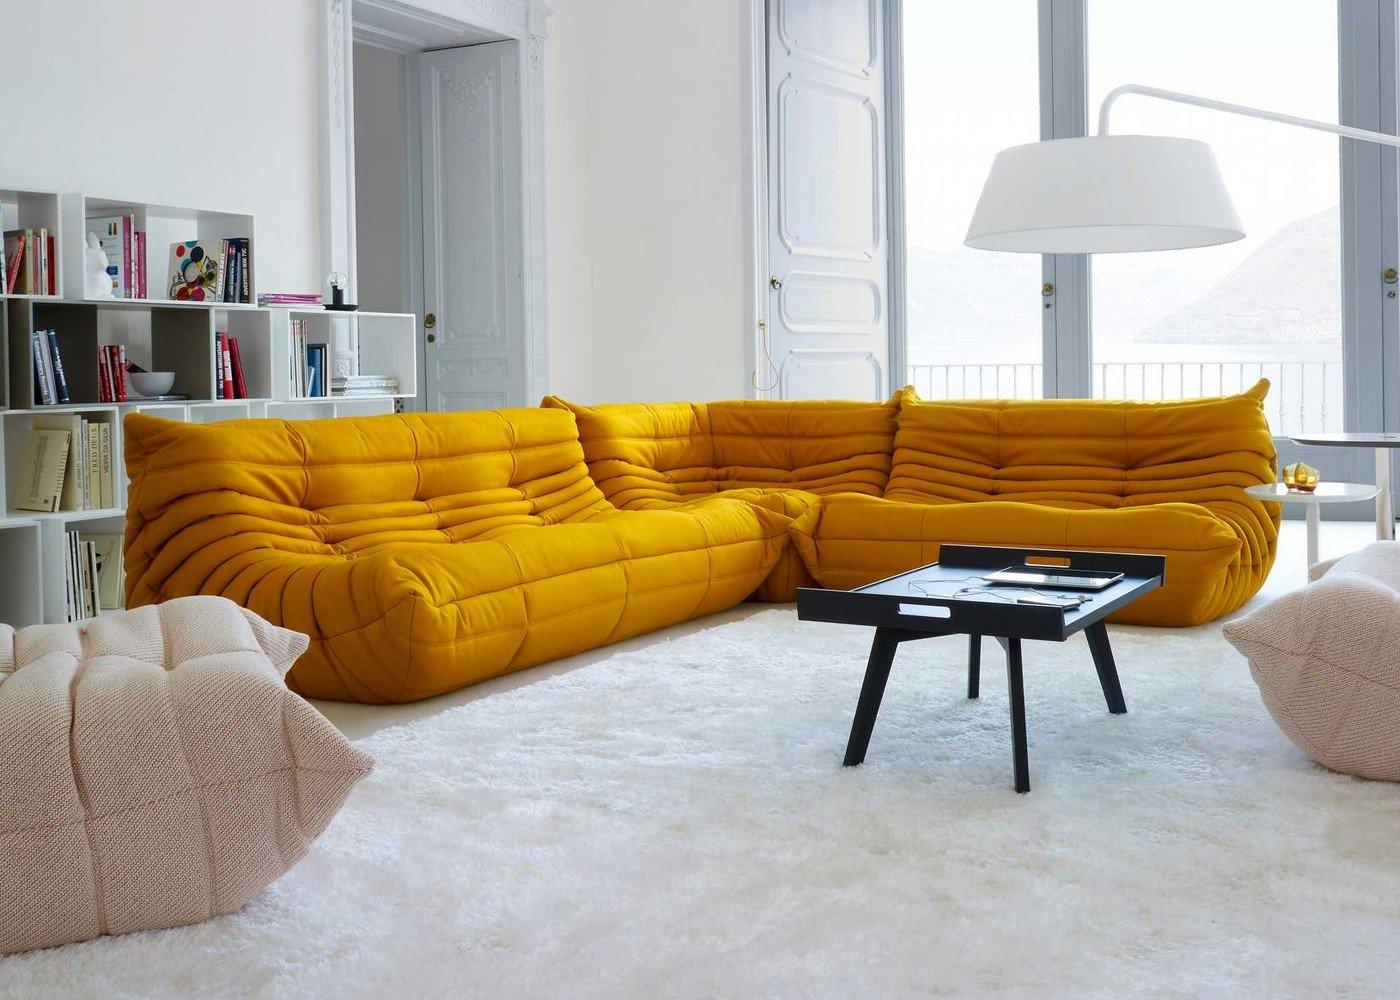 Full Size of Ligne Roset Sofa Bed Ebay Multy Furniture For Sale Uk Togo Second Hand Prado Confluences Ireland Review Knock Off Modular Corner Complete Heals Mega Leinen Sofa Ligne Roset Sofa